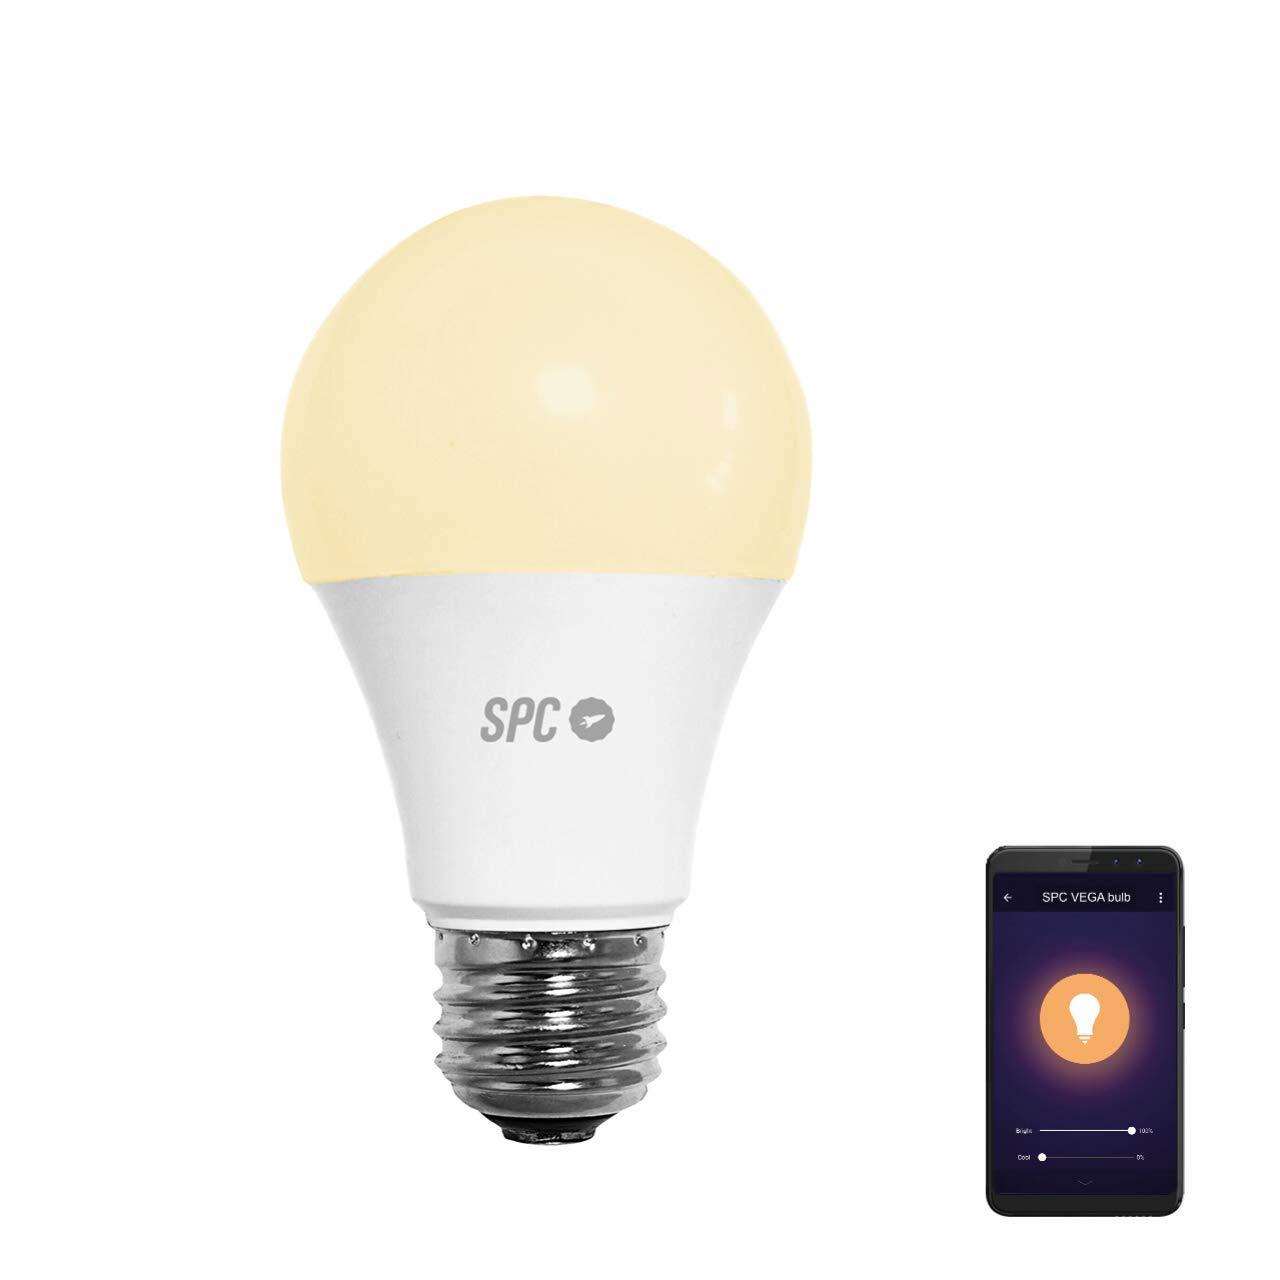 SPC Vega 1050 - Bombilla LED Wi-Fi E27, 10 W, 1050 lm, iluminación inteligente, luz blanca regulable (2700-6500K), control remoto mediante app SPC IoT, Compatible con Alexa, Google Home, A+, Blanco: Spc-Internet: